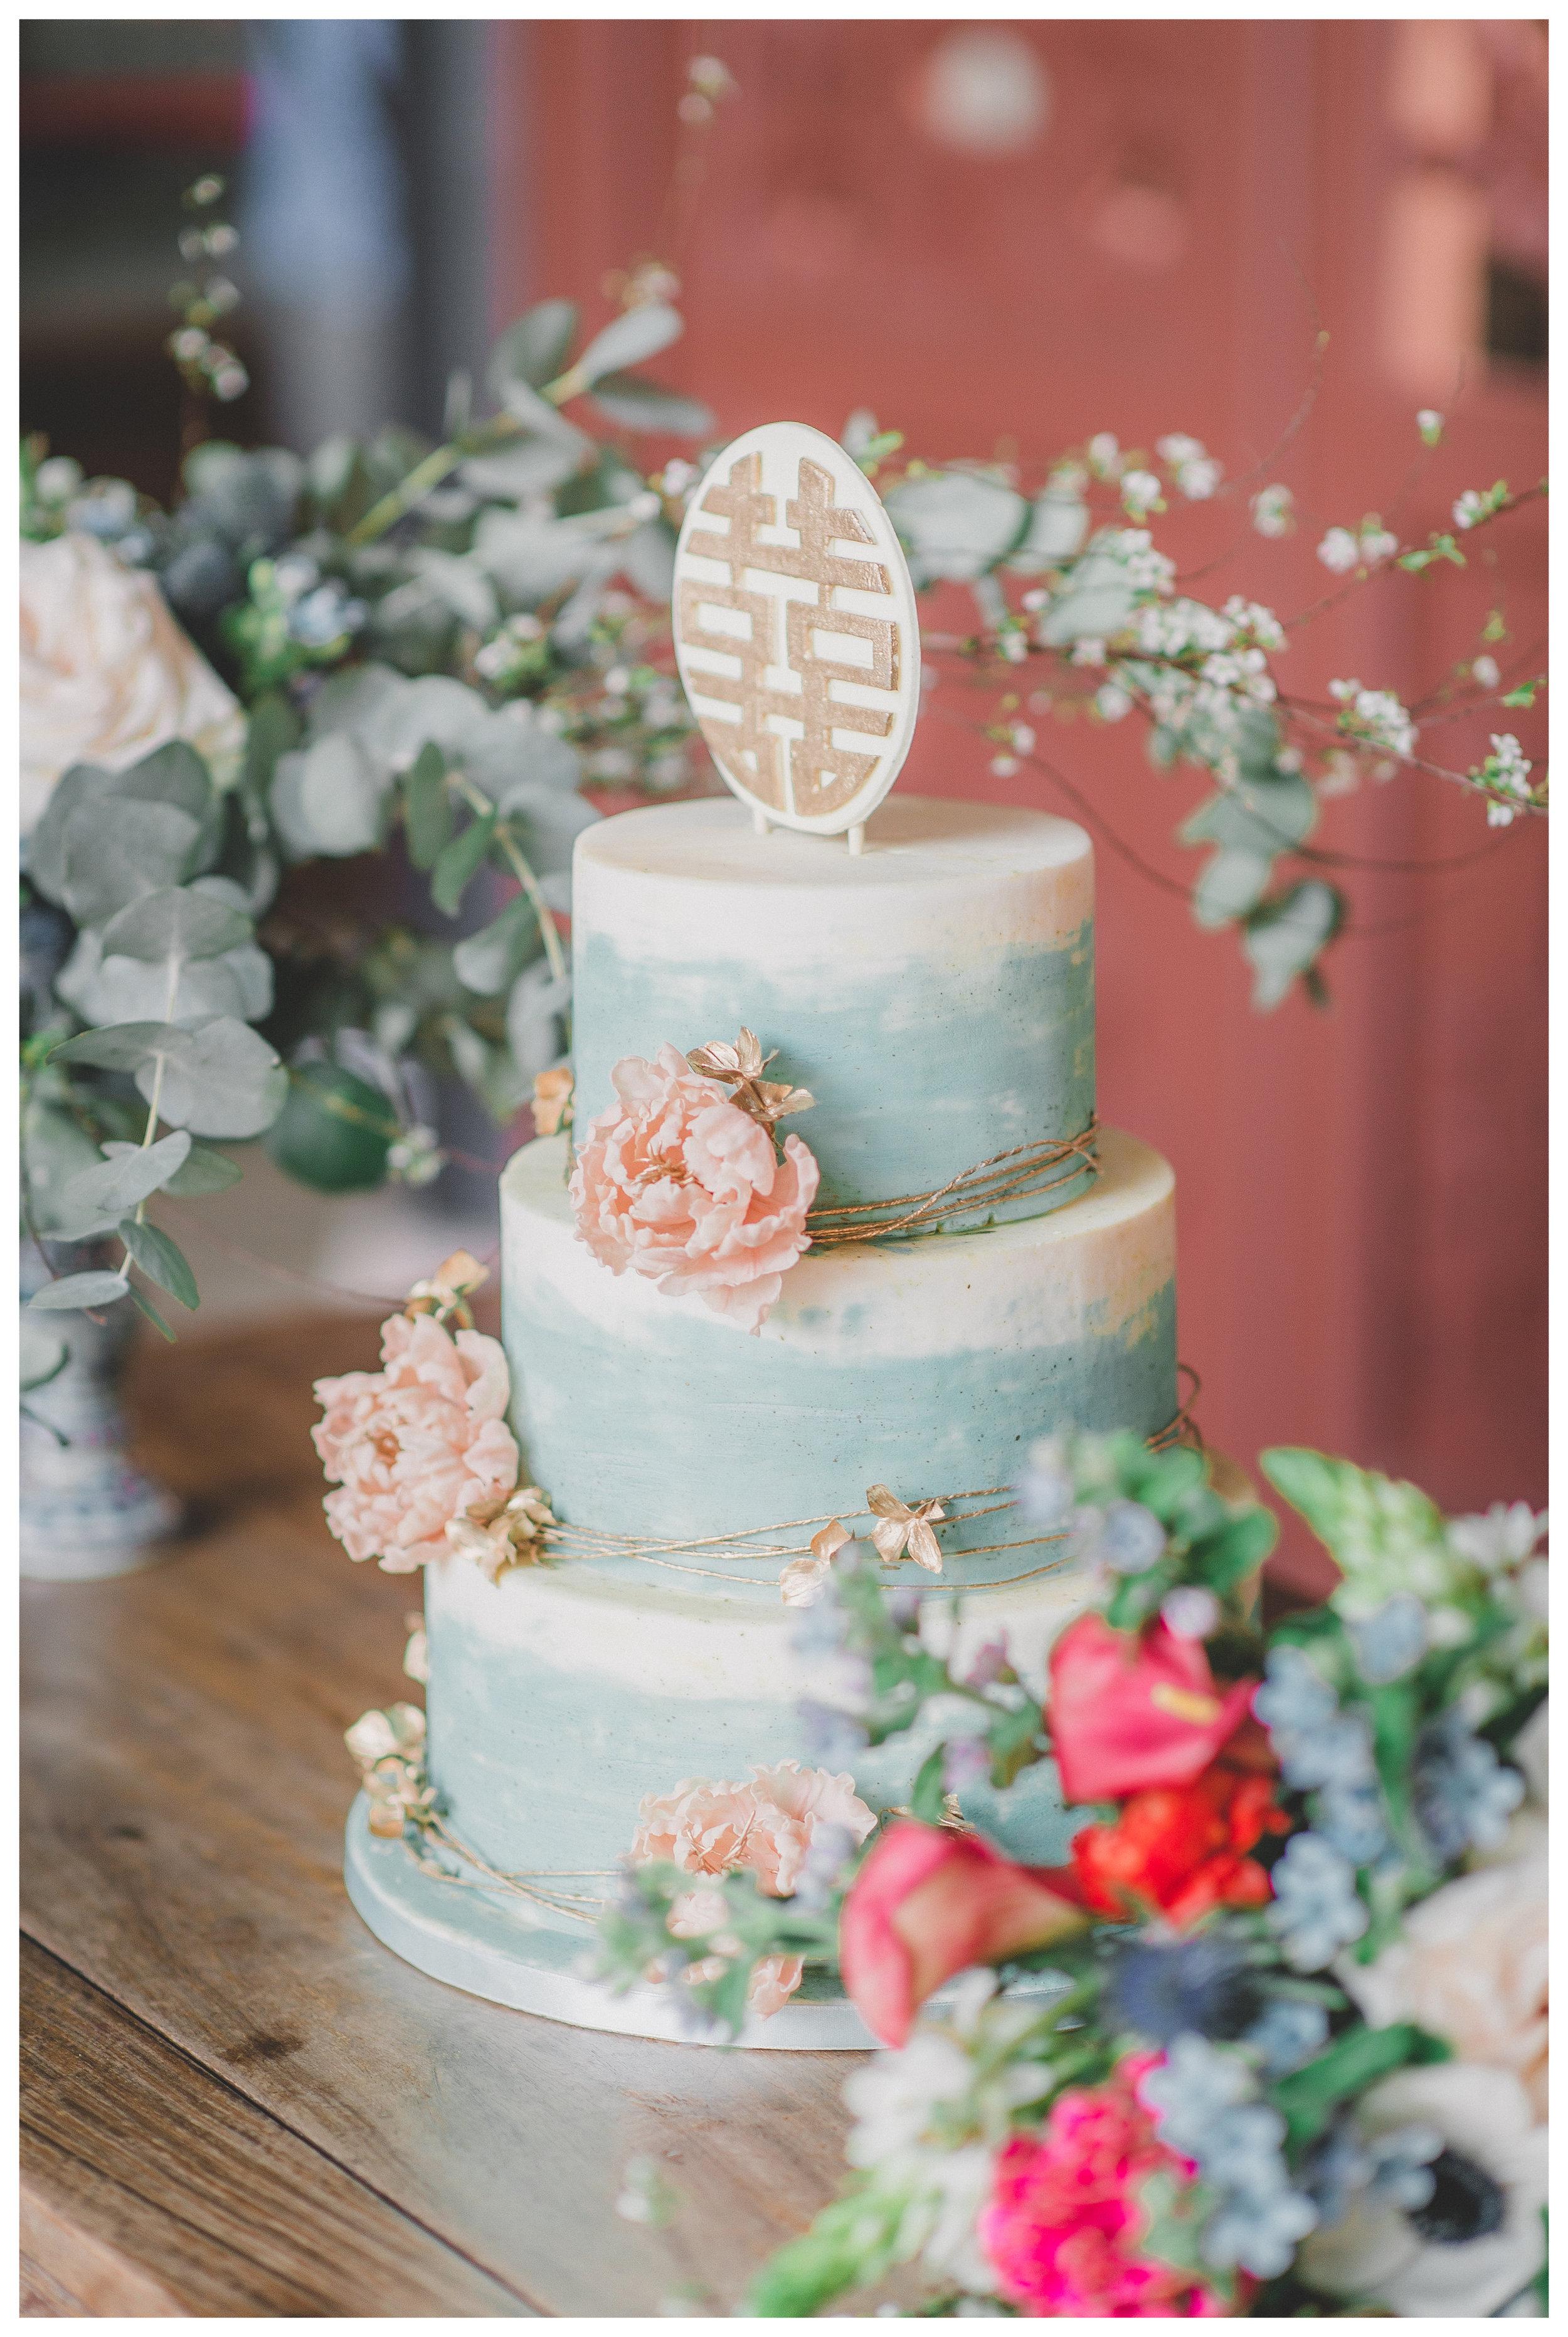 Chinese Style Wedding Cake (Vincent).jpg